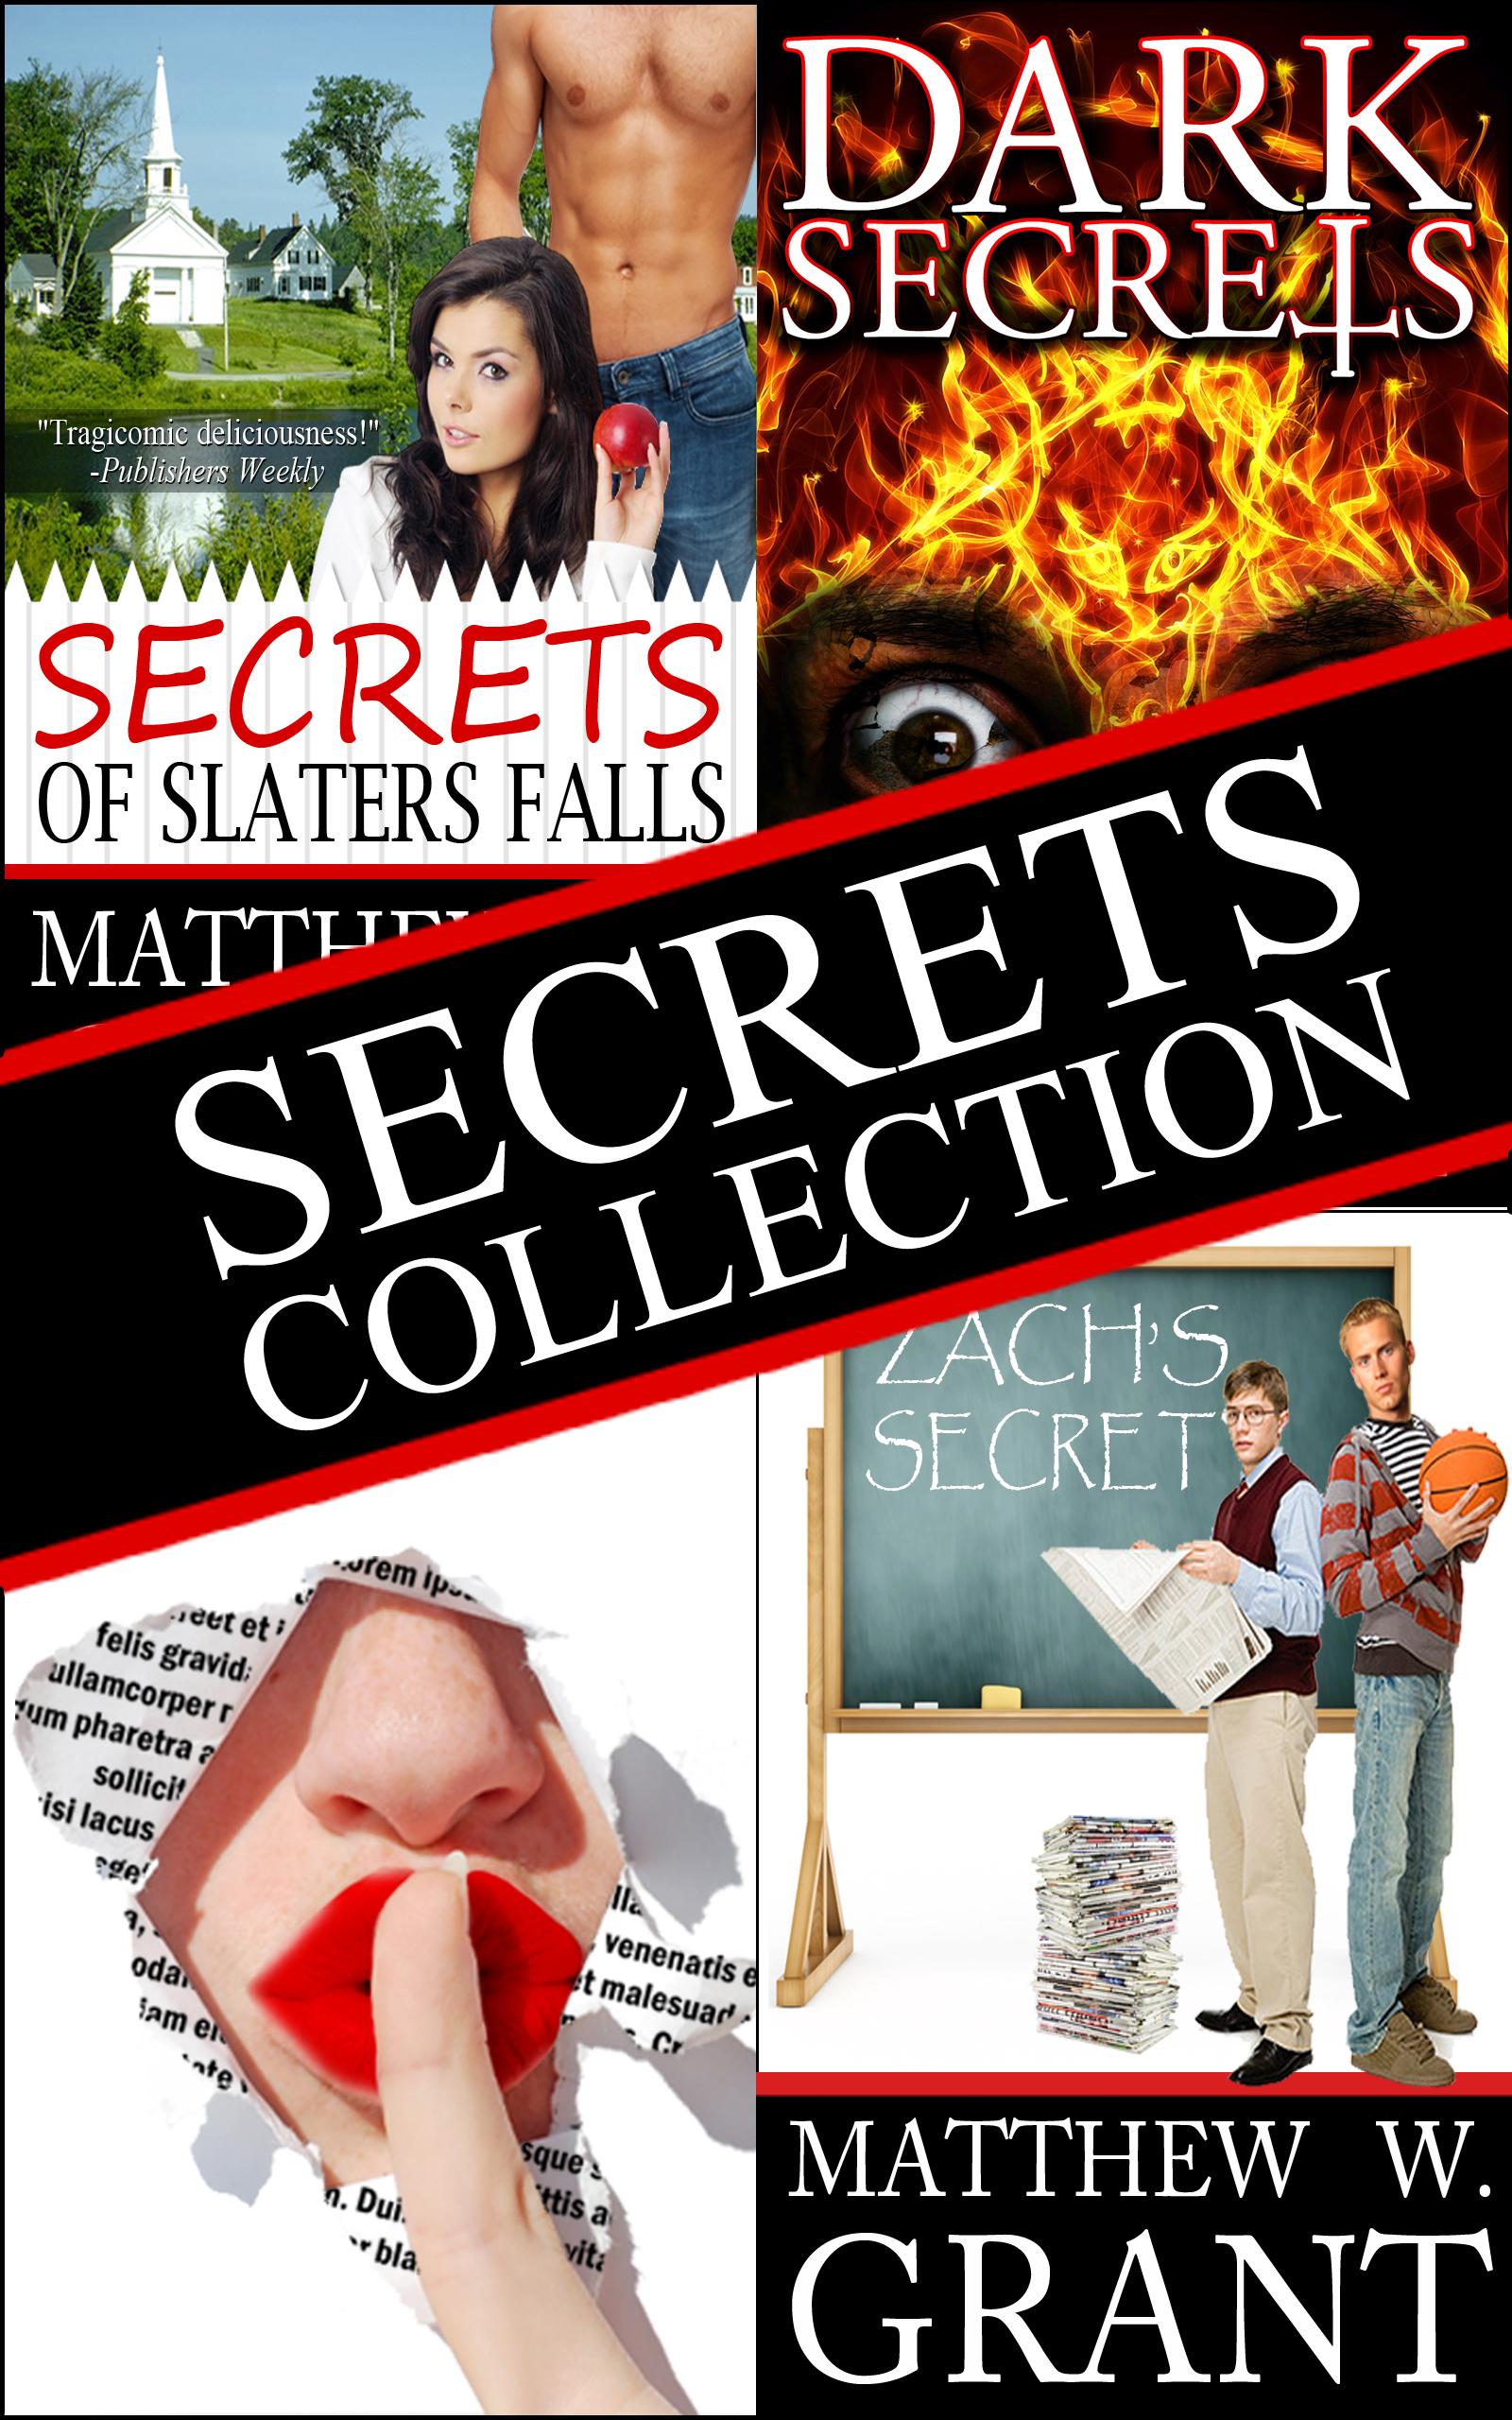 Matthew W. Grant - The Secrets Collection: 3 Novels, 3 Genres Boxed Set Bundle